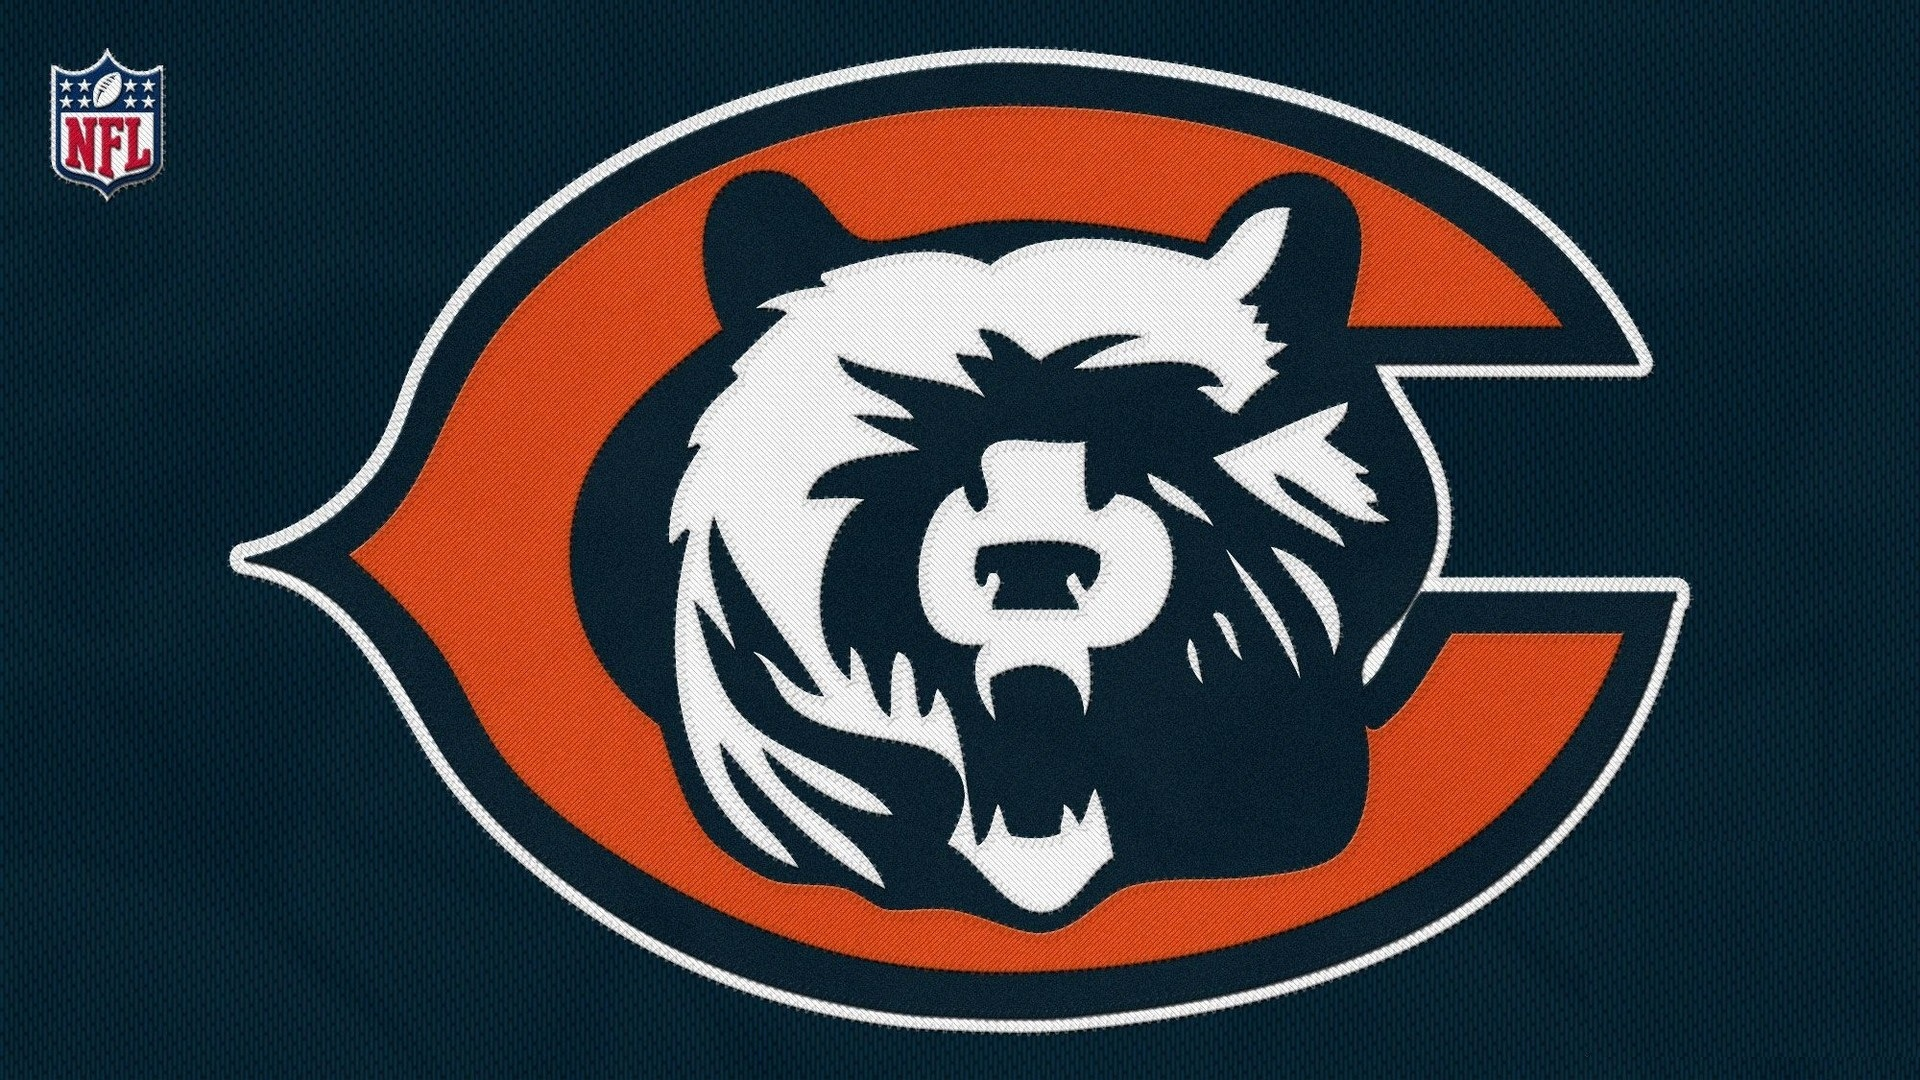 Chicago Bears For Desktop Wallpaper   2021 NFL Football Wallpapers 1920x1080